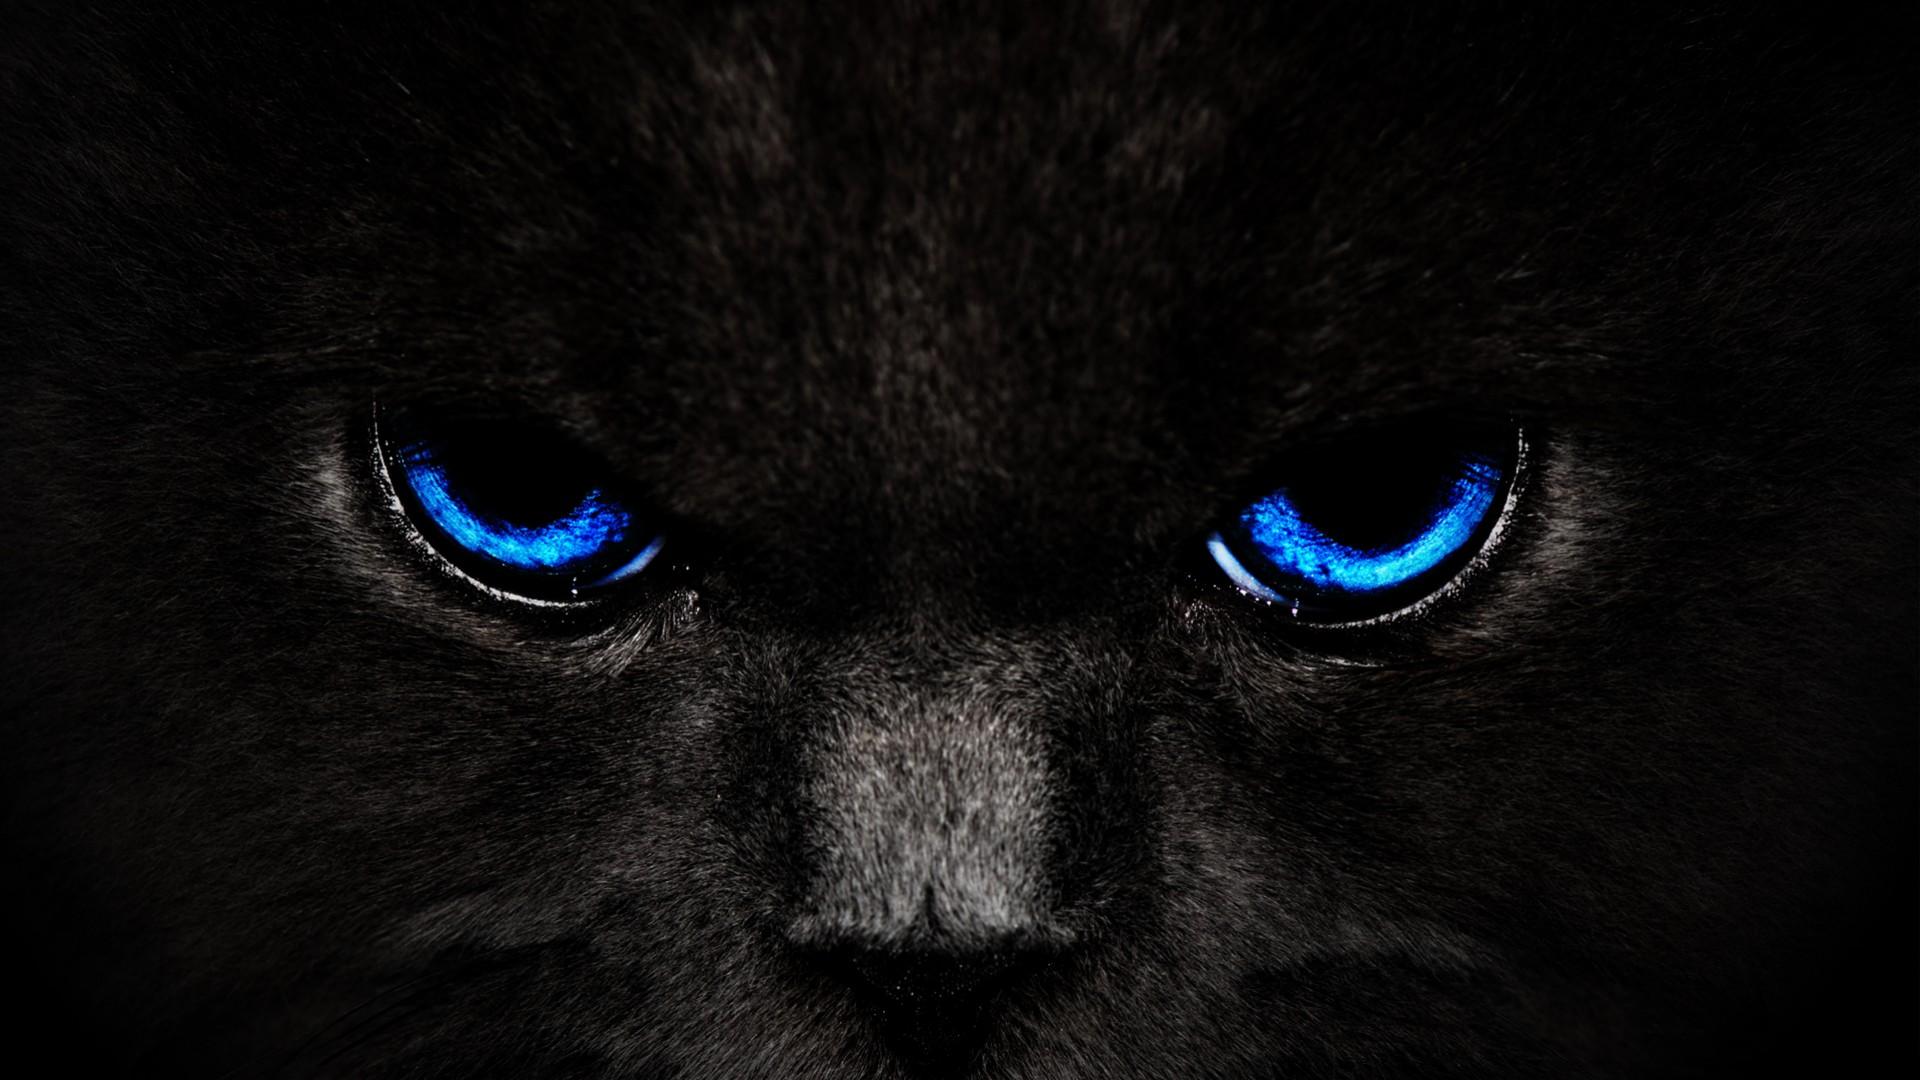 Blue Eye Cat HD Wallpaper 1920x1080